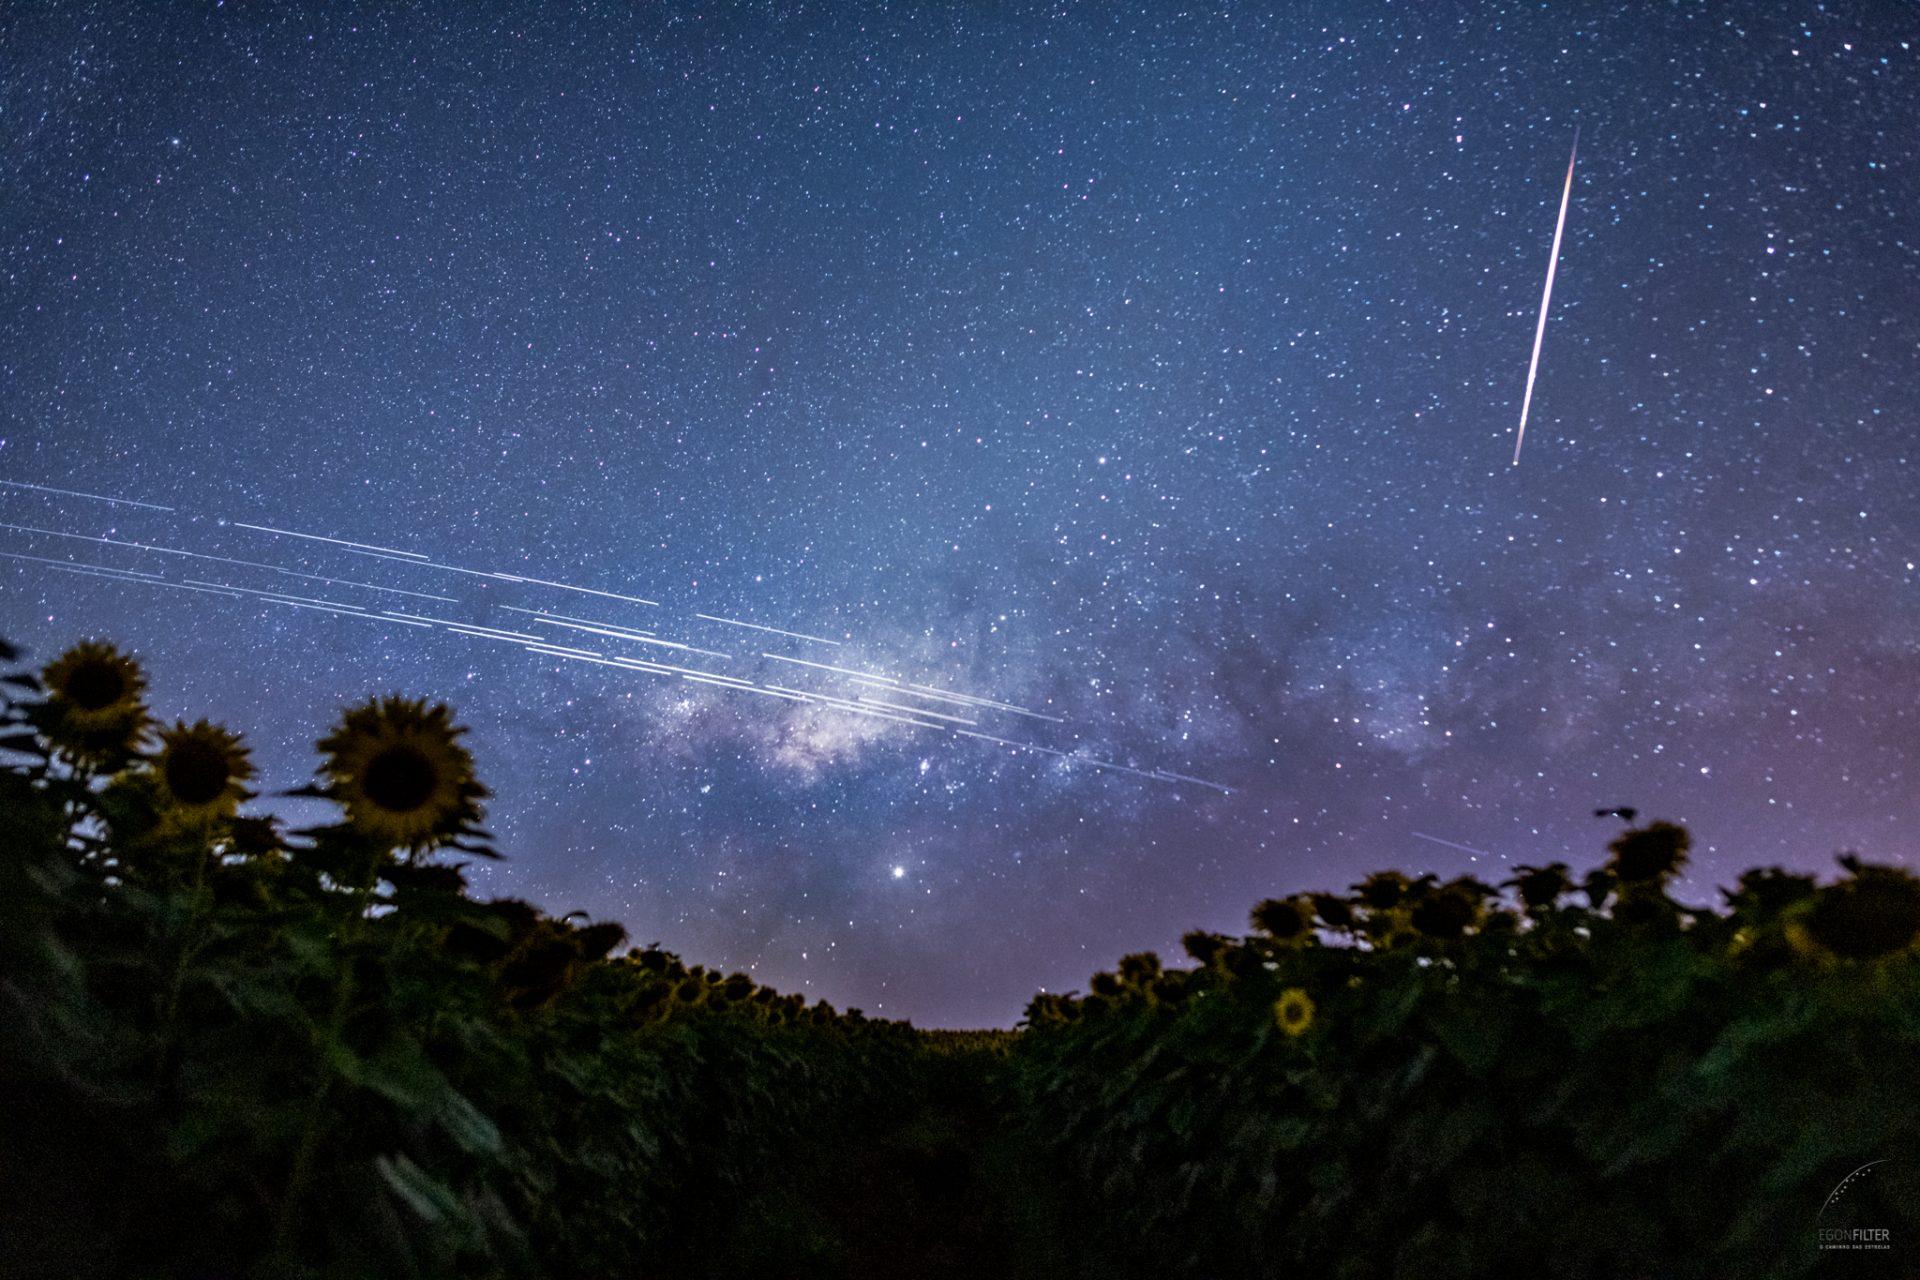 Satélites Starlink menos brilhantes: SpaceX tenta tranquilizar profissionais da astronomia